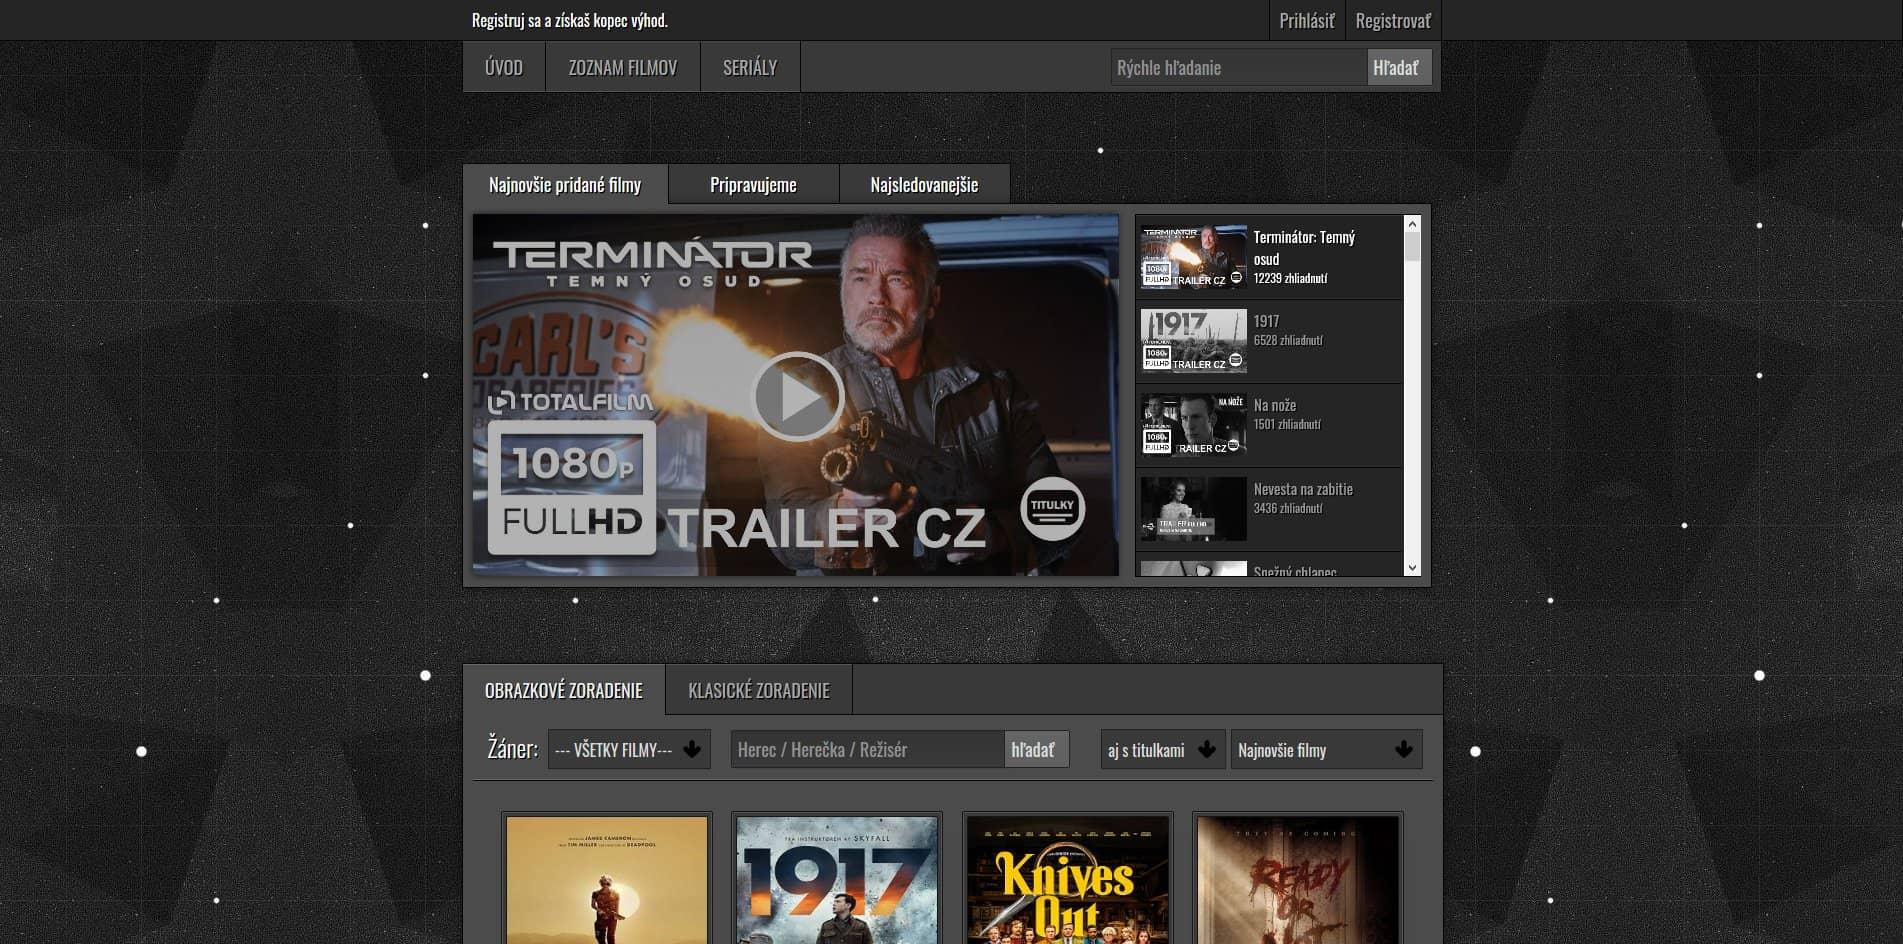 Bombuj.tv online filmy a seriály zdarma – Tajné tipy a seznamy filmů